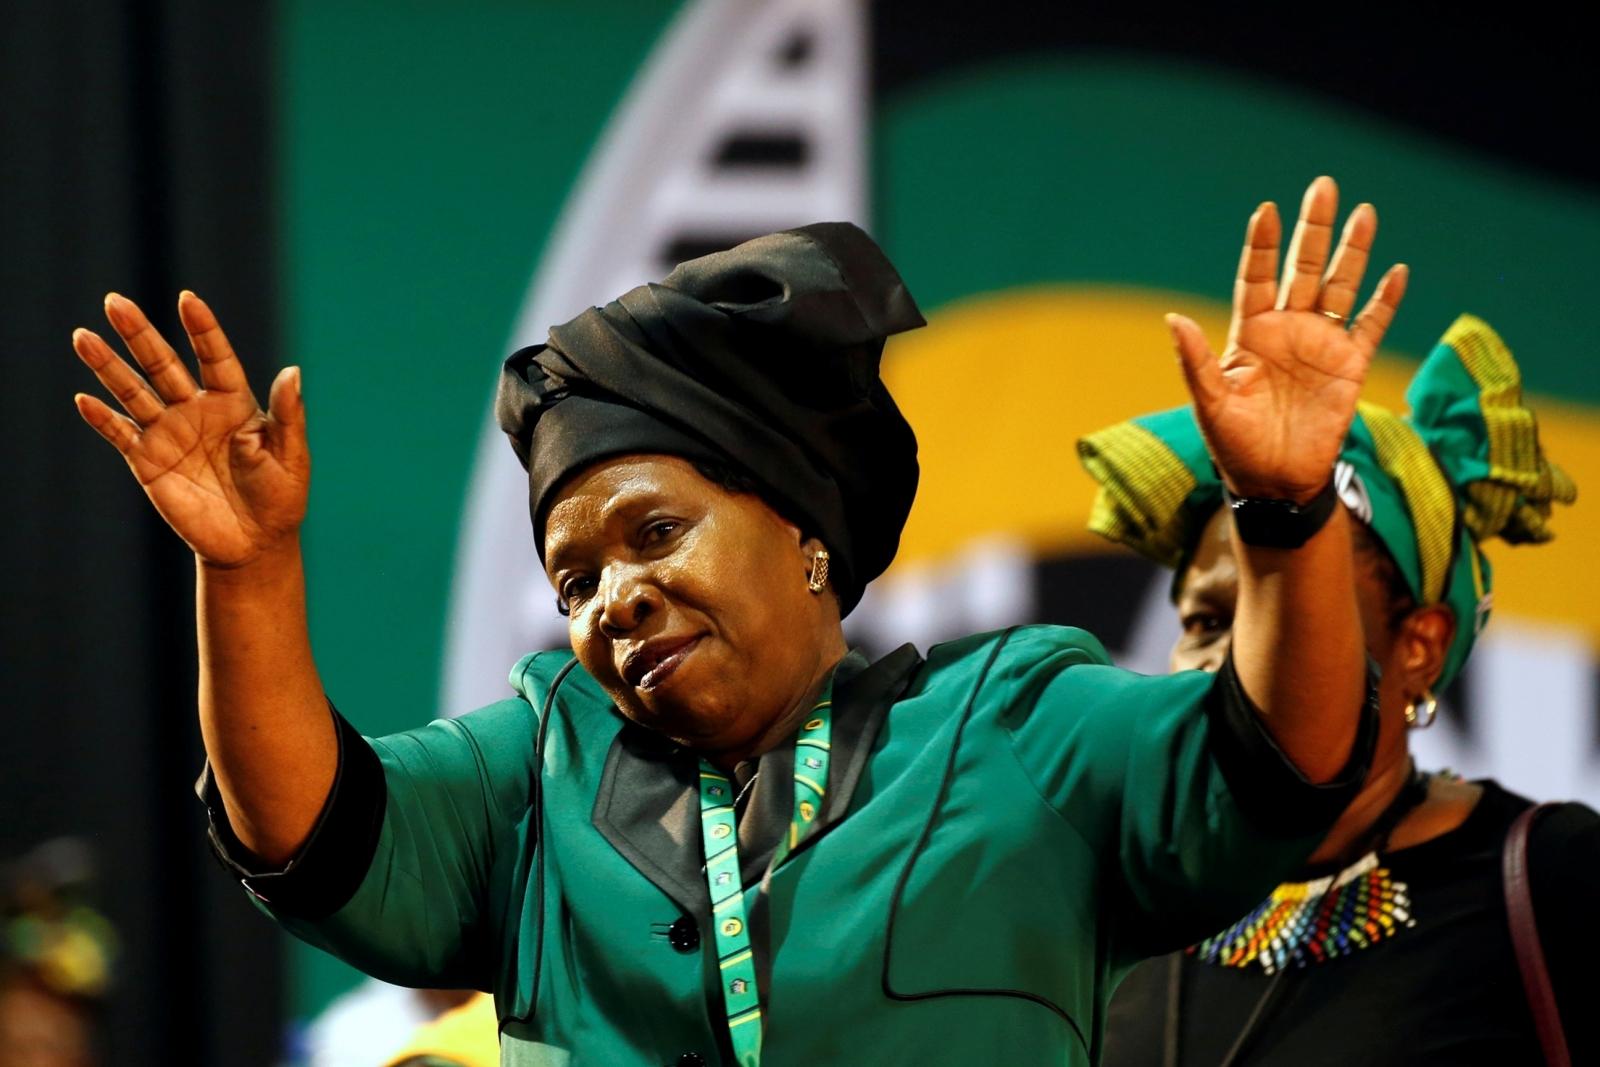 Nkosazana Dlamini-Zuma South Africa ANC